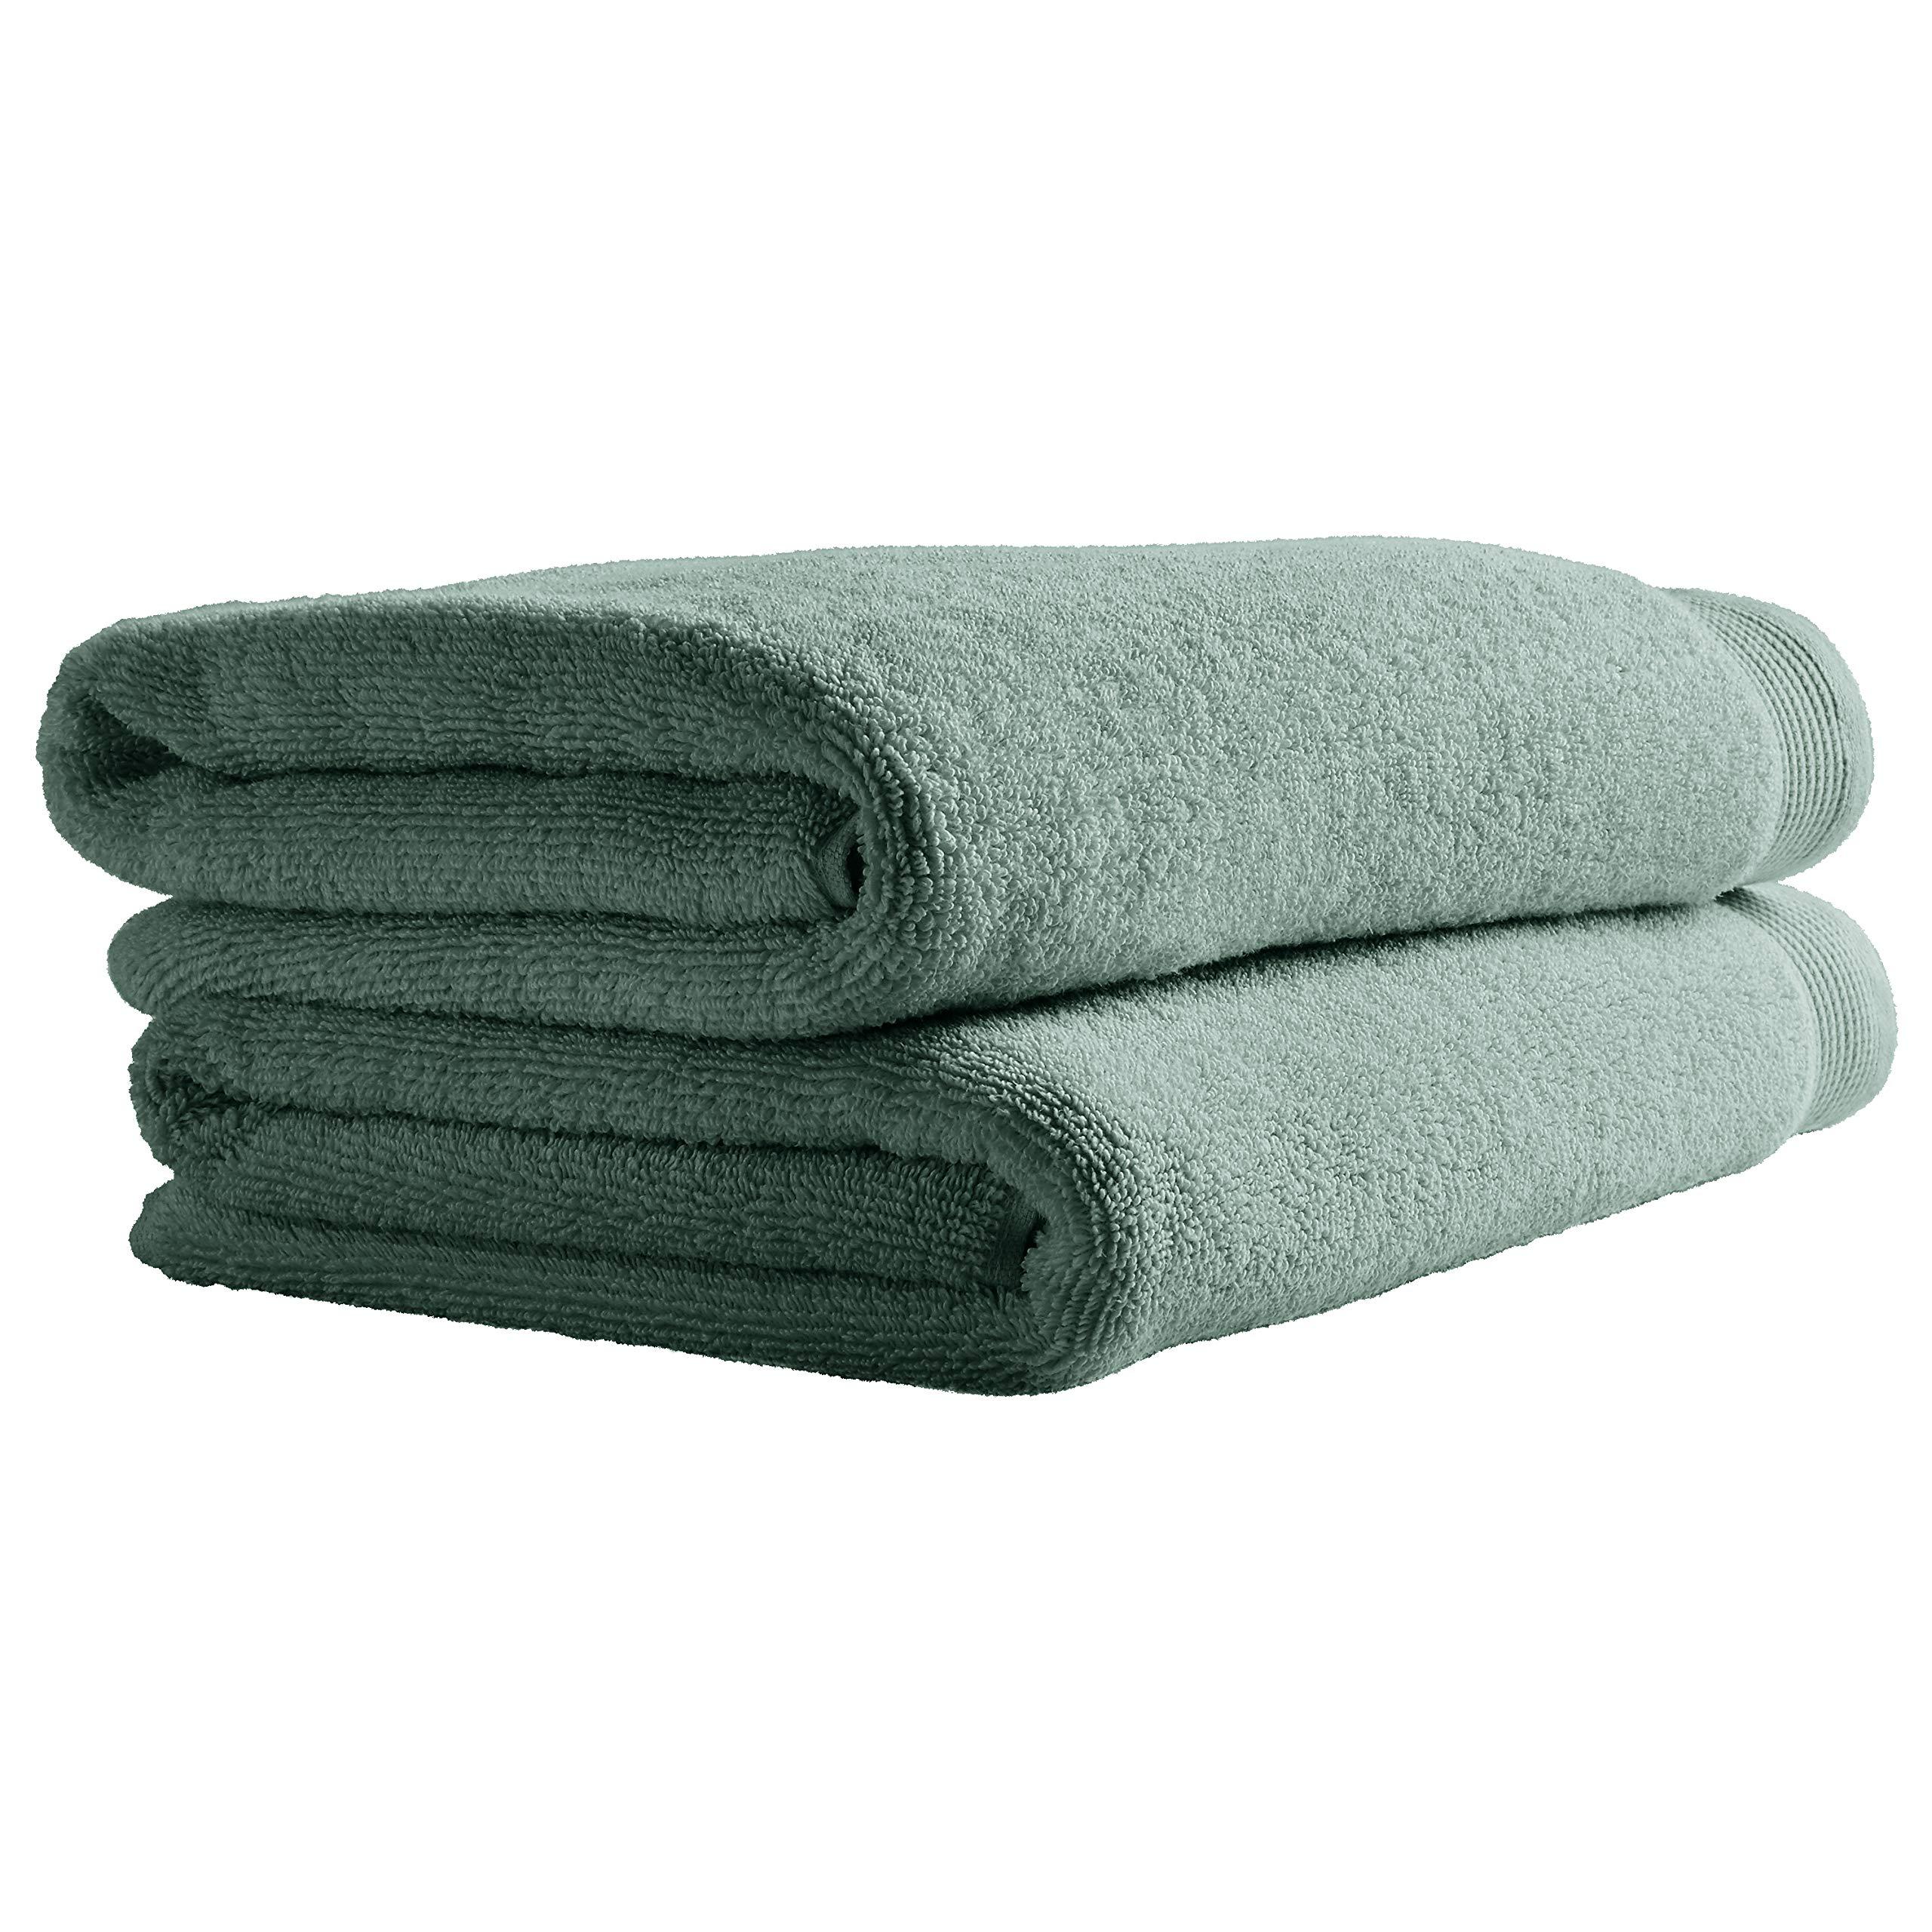 Stone & Beam Organic Cotton Bath Towels, Set of 2, Lagoon